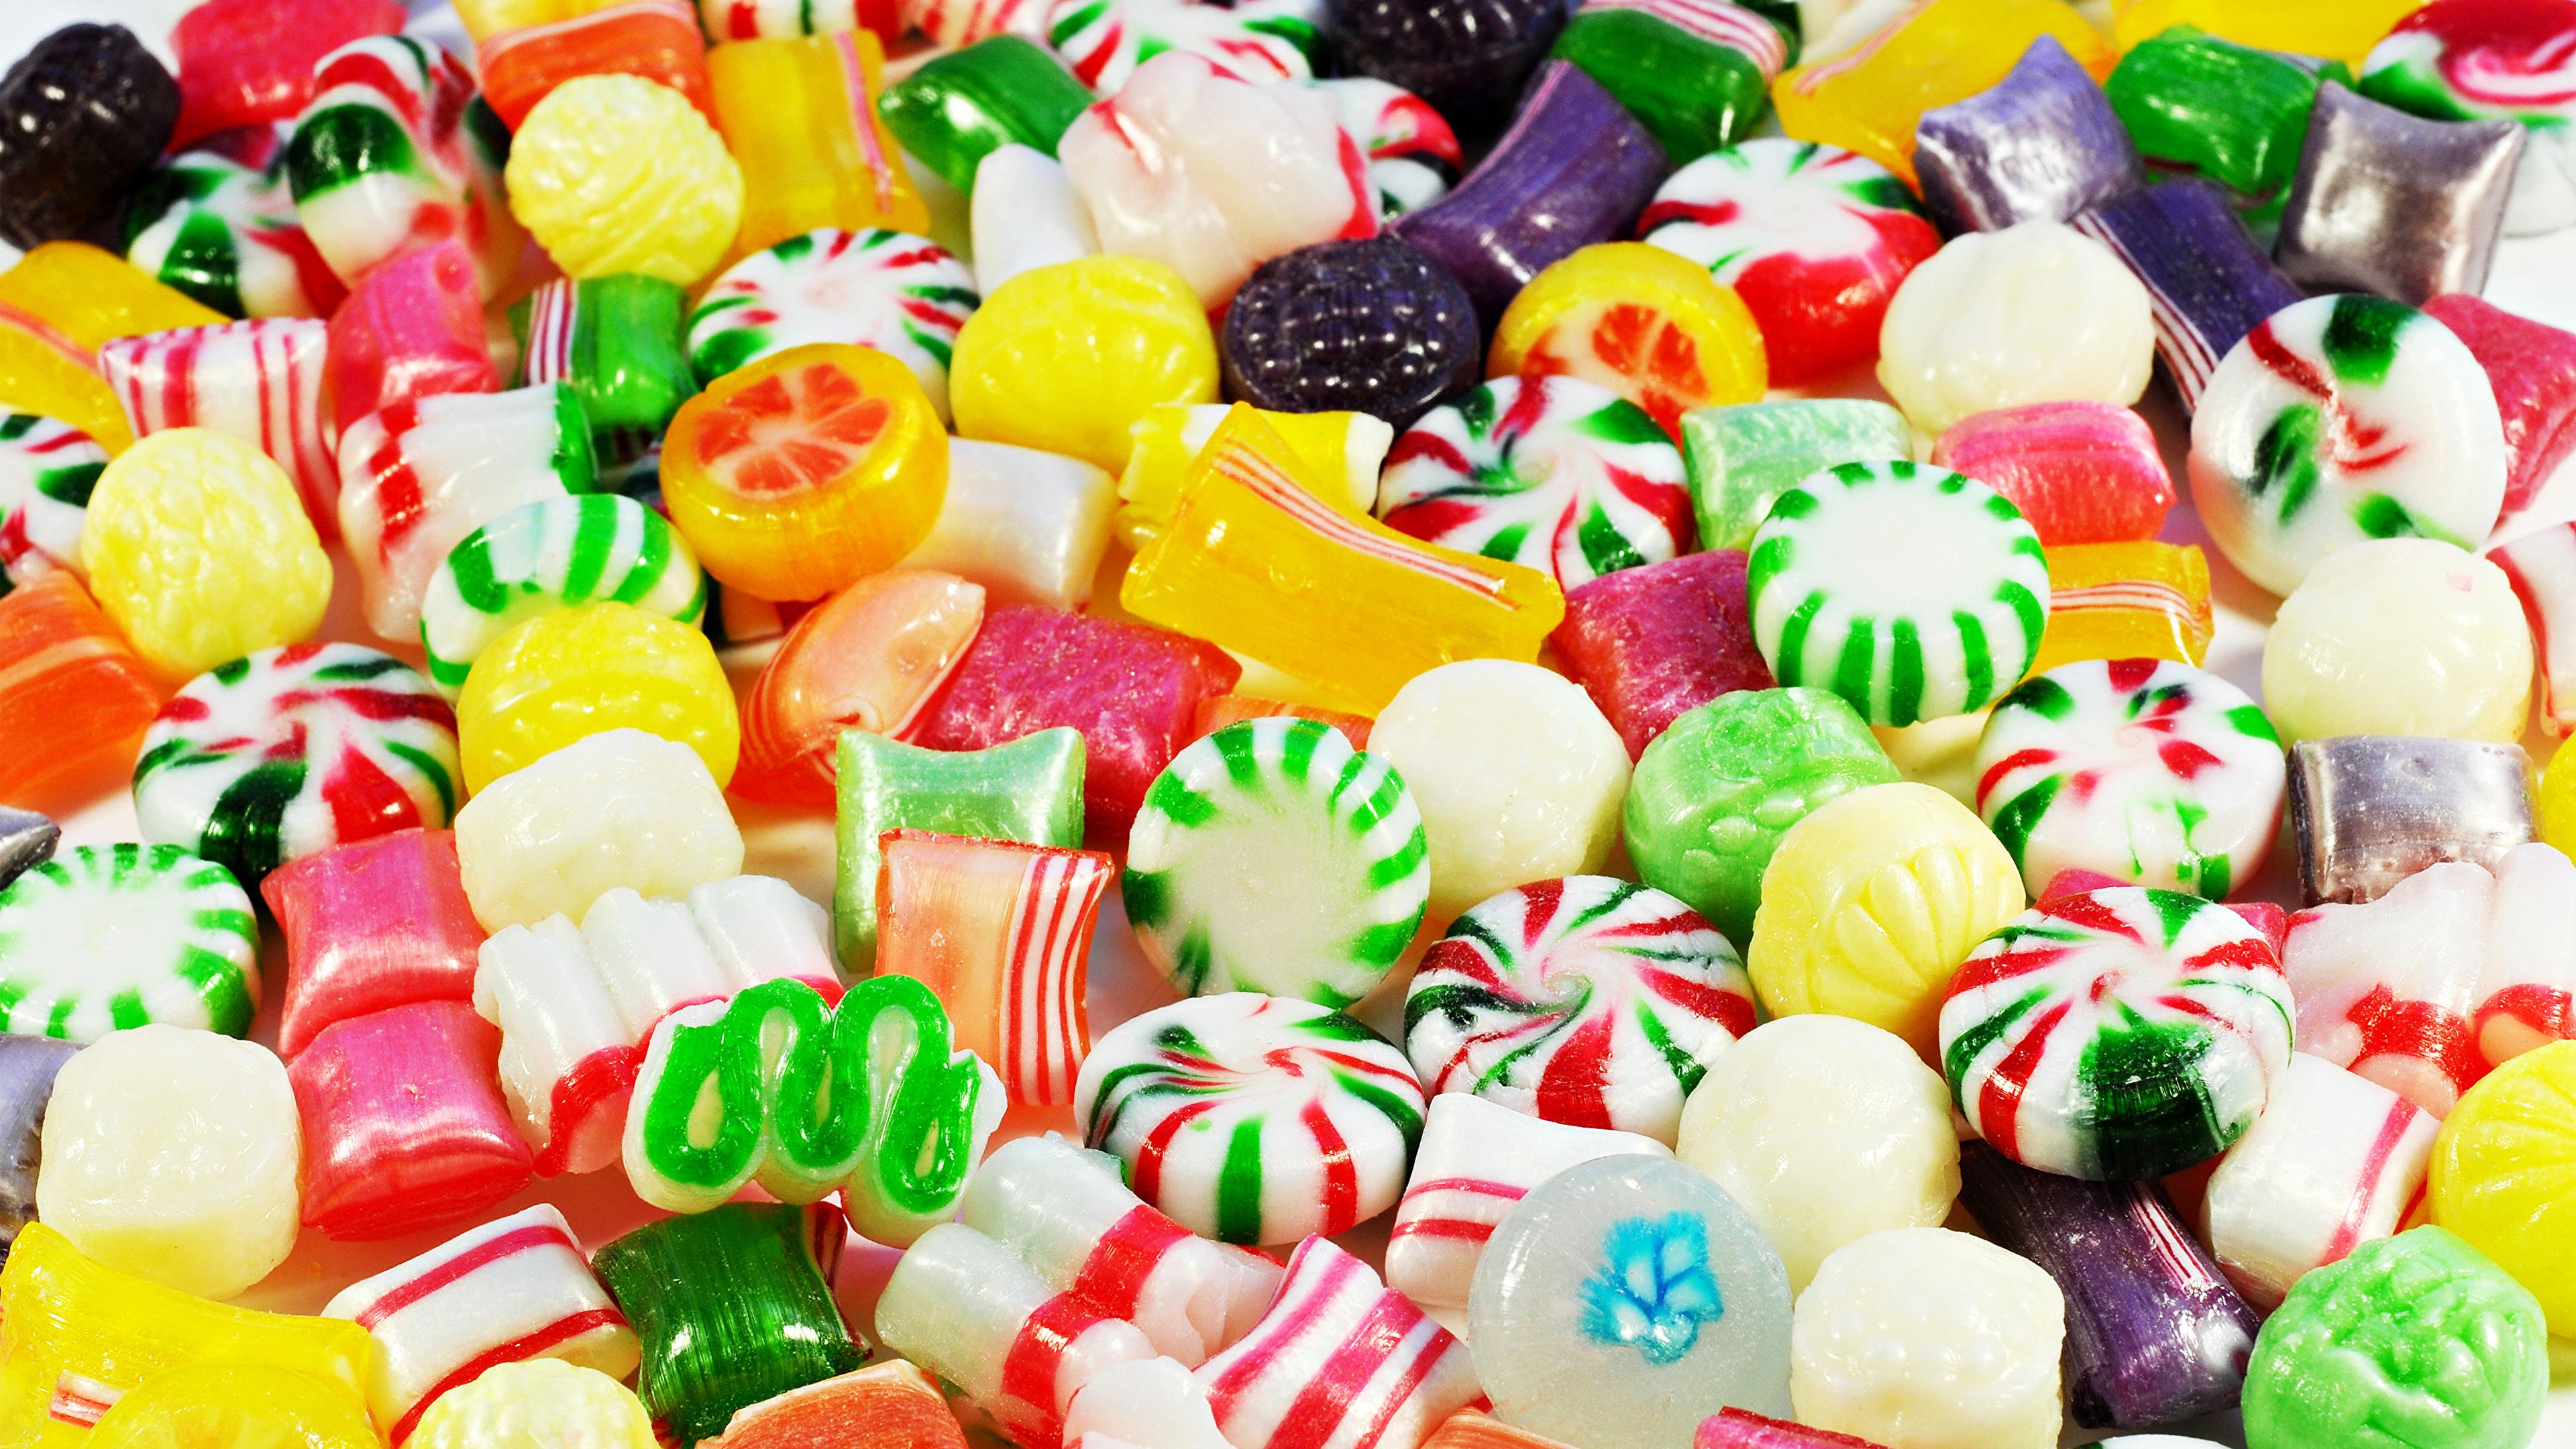 https://s1.1zoom.ru/b4946/790/Sweets_Candy_Many_516414_3840x2160.jpg